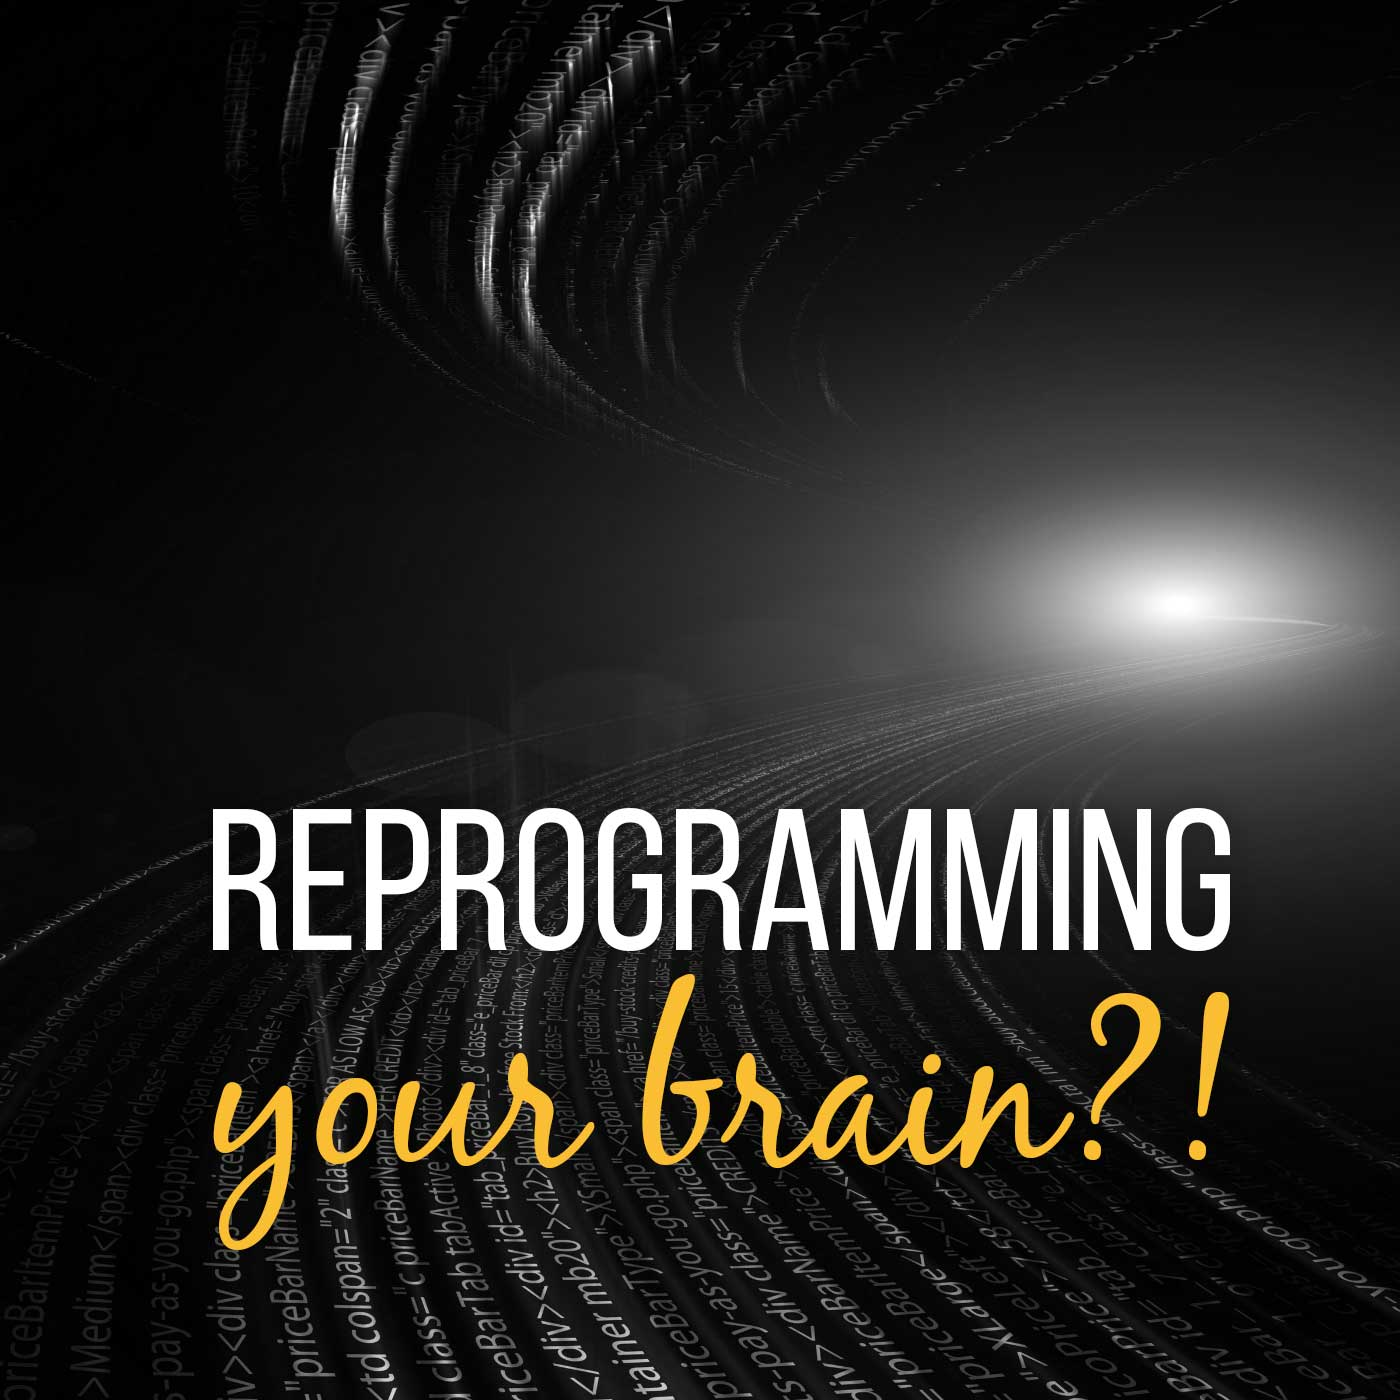 Reprogramming your brain?